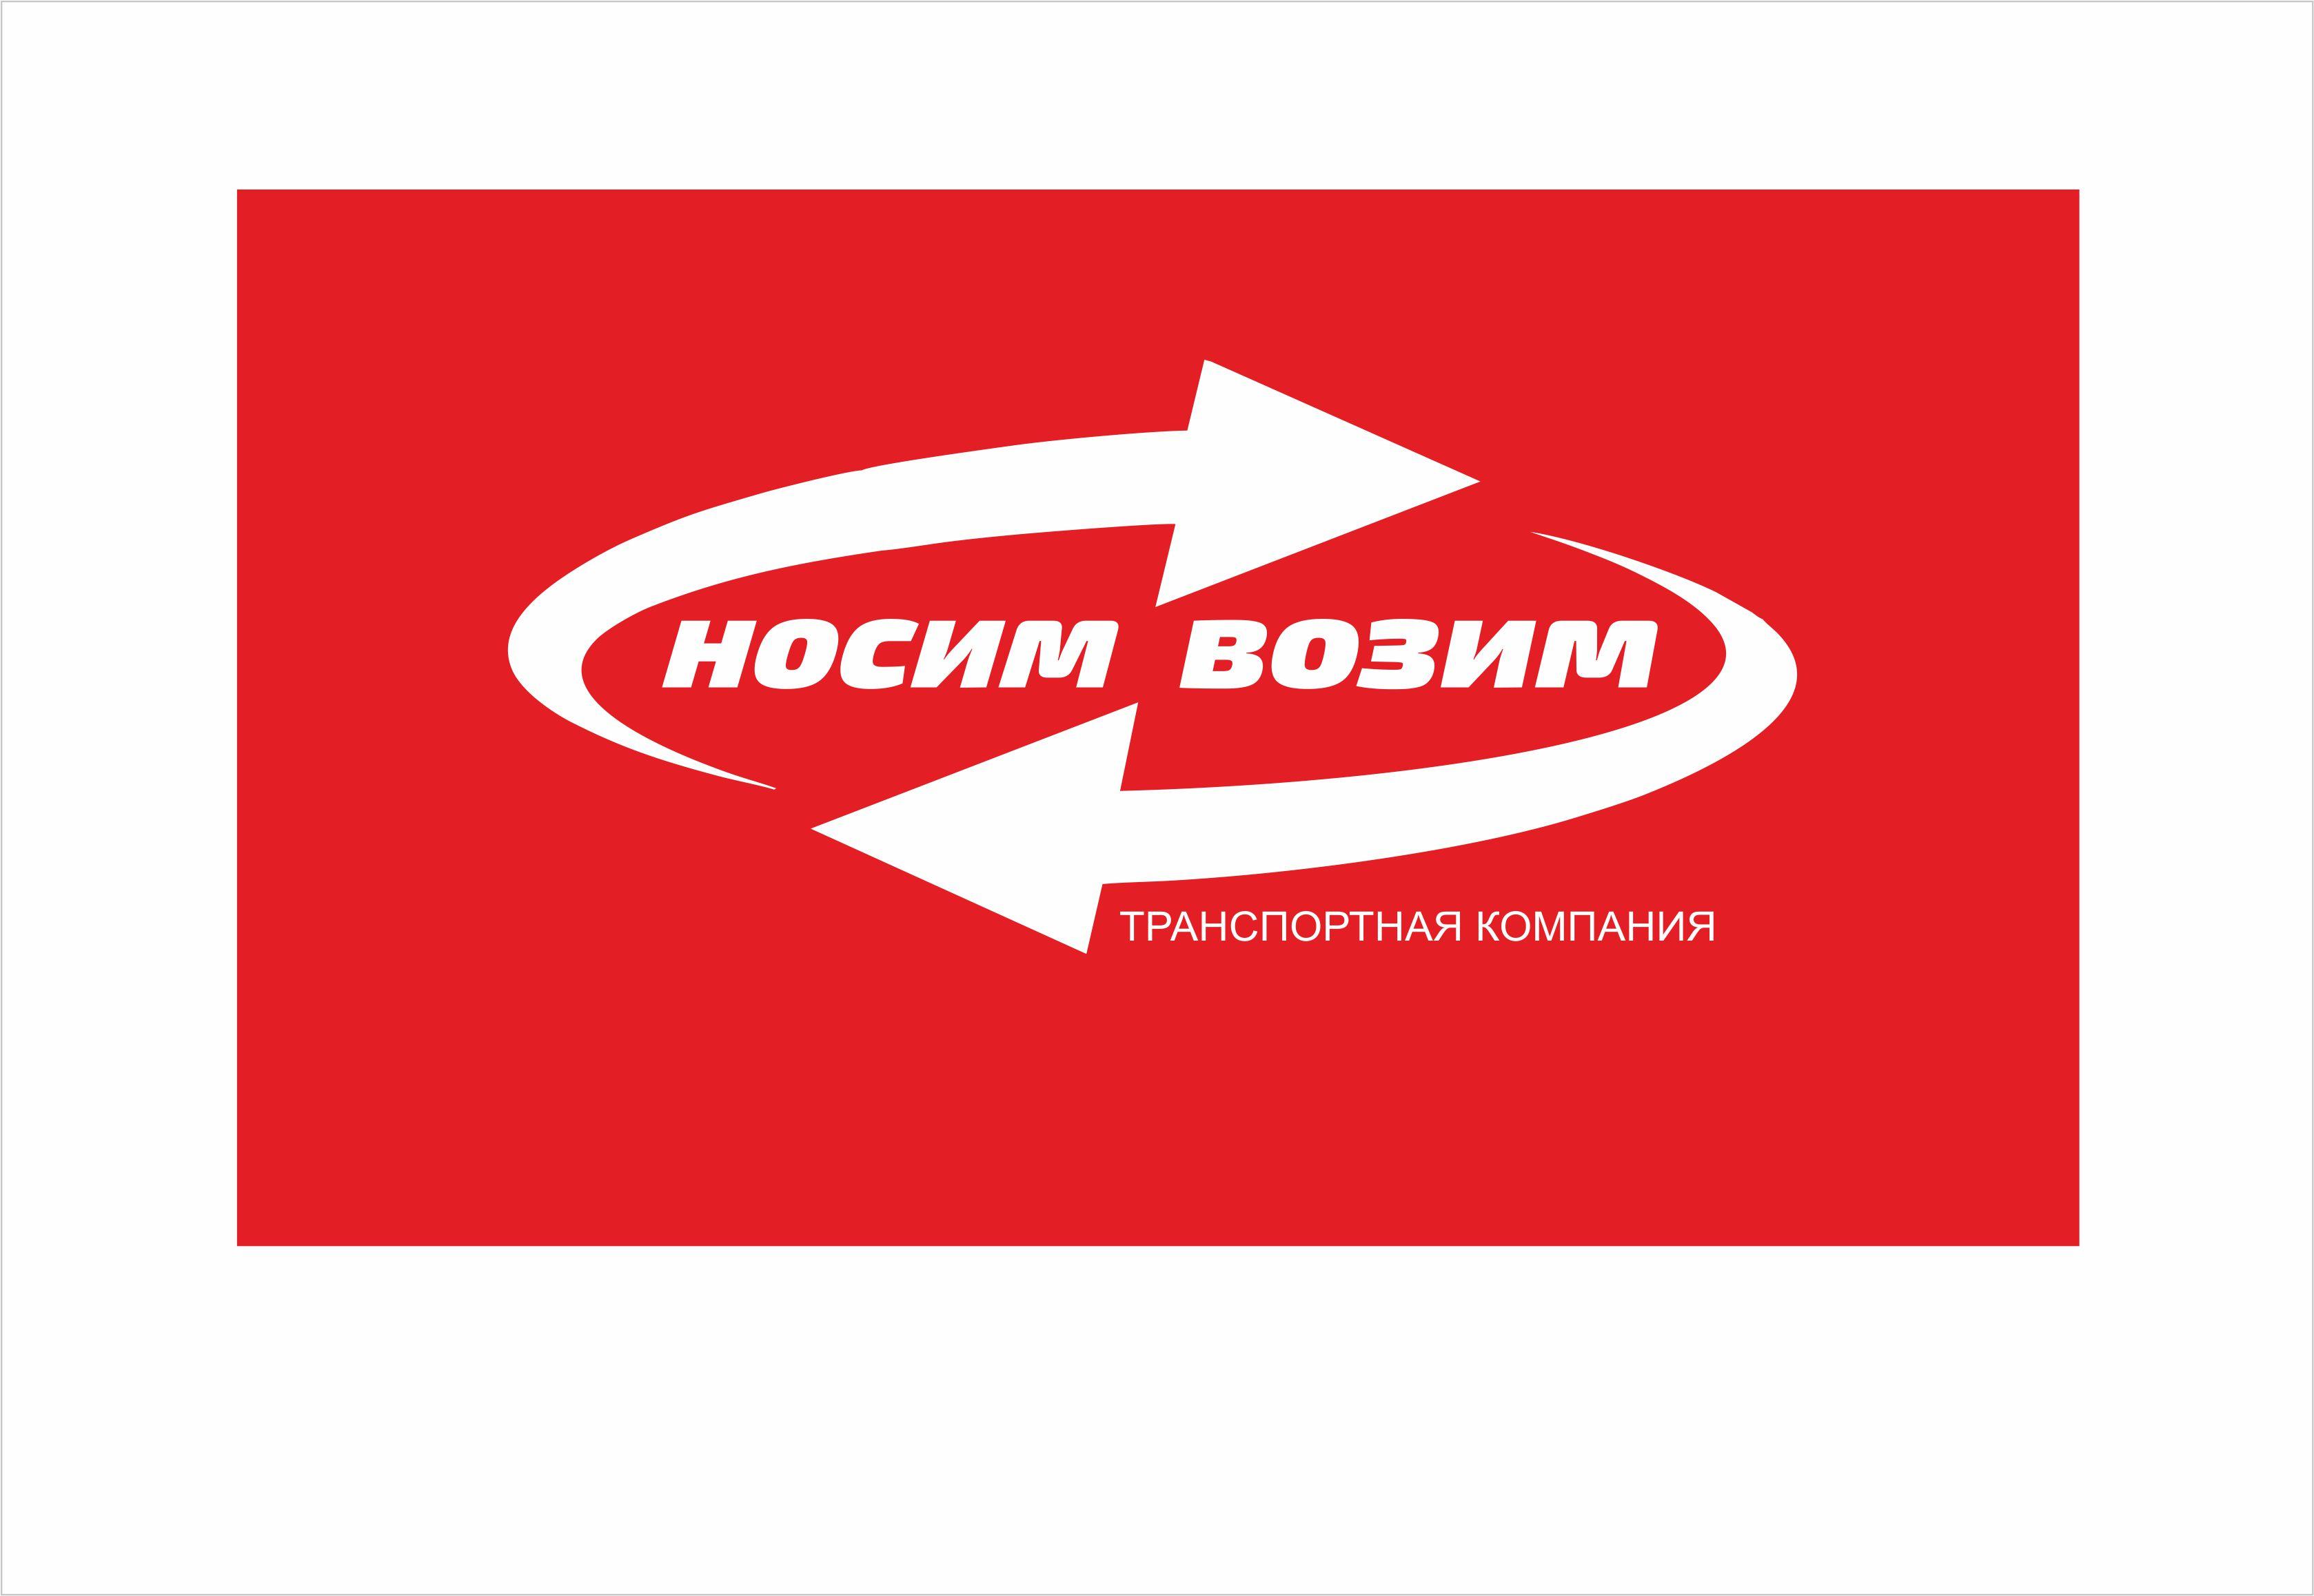 Логотип компании по перевозкам НосимВозим фото f_0425cf8a304bd916.jpg